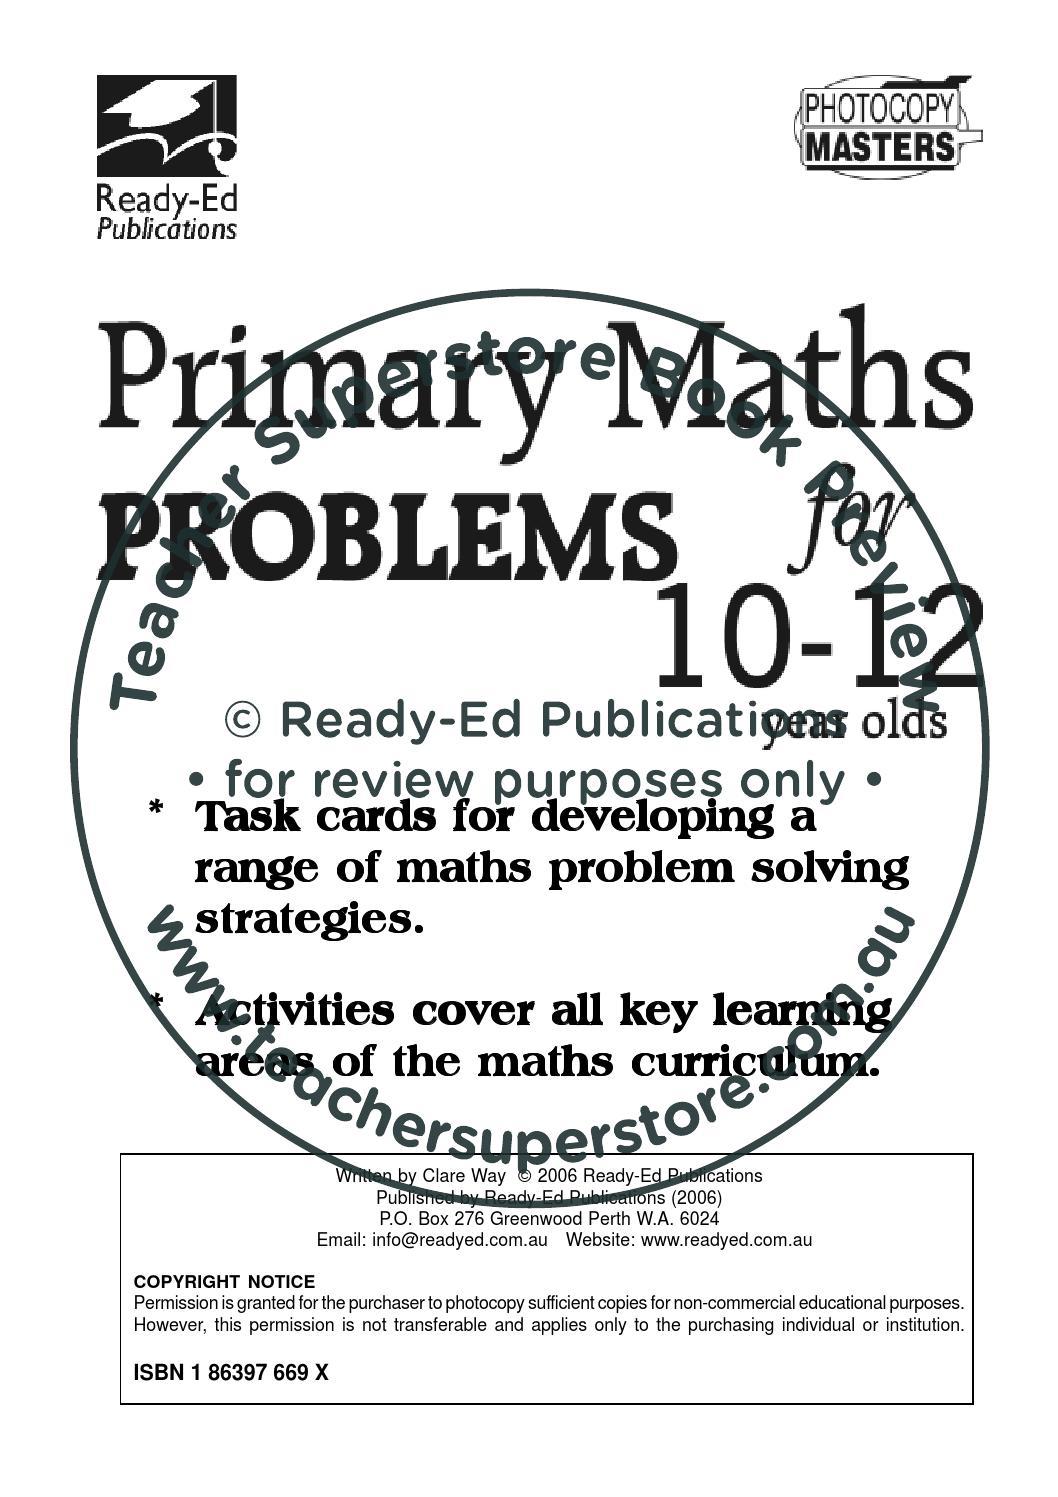 Charming Maths Solving Website Ideas - Math Worksheets - modopol.com